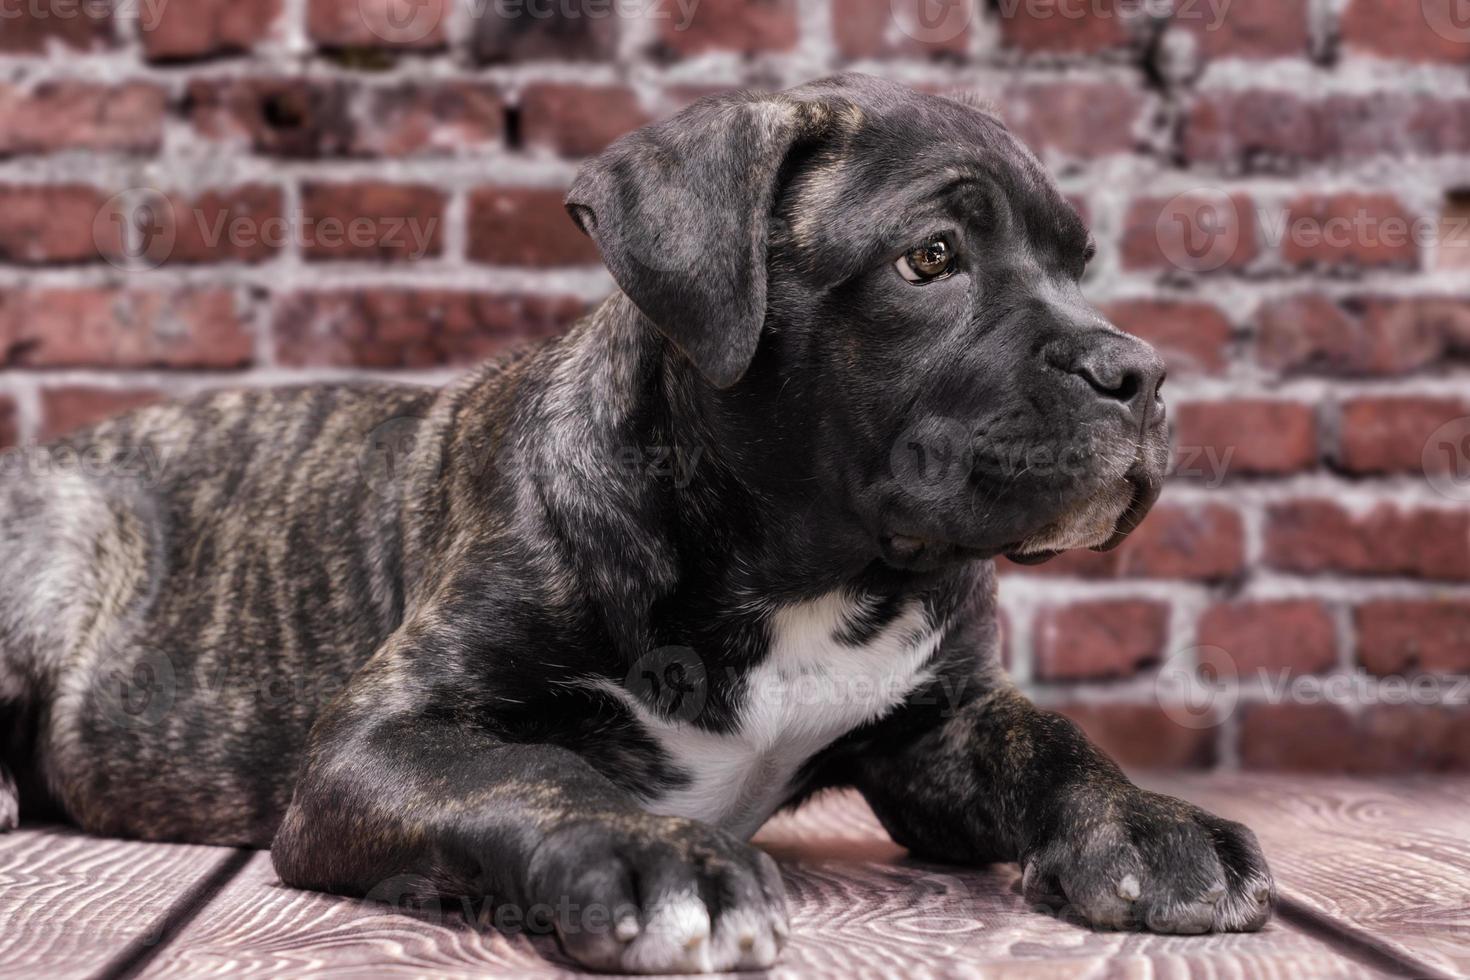 cachorro negro acostado foto